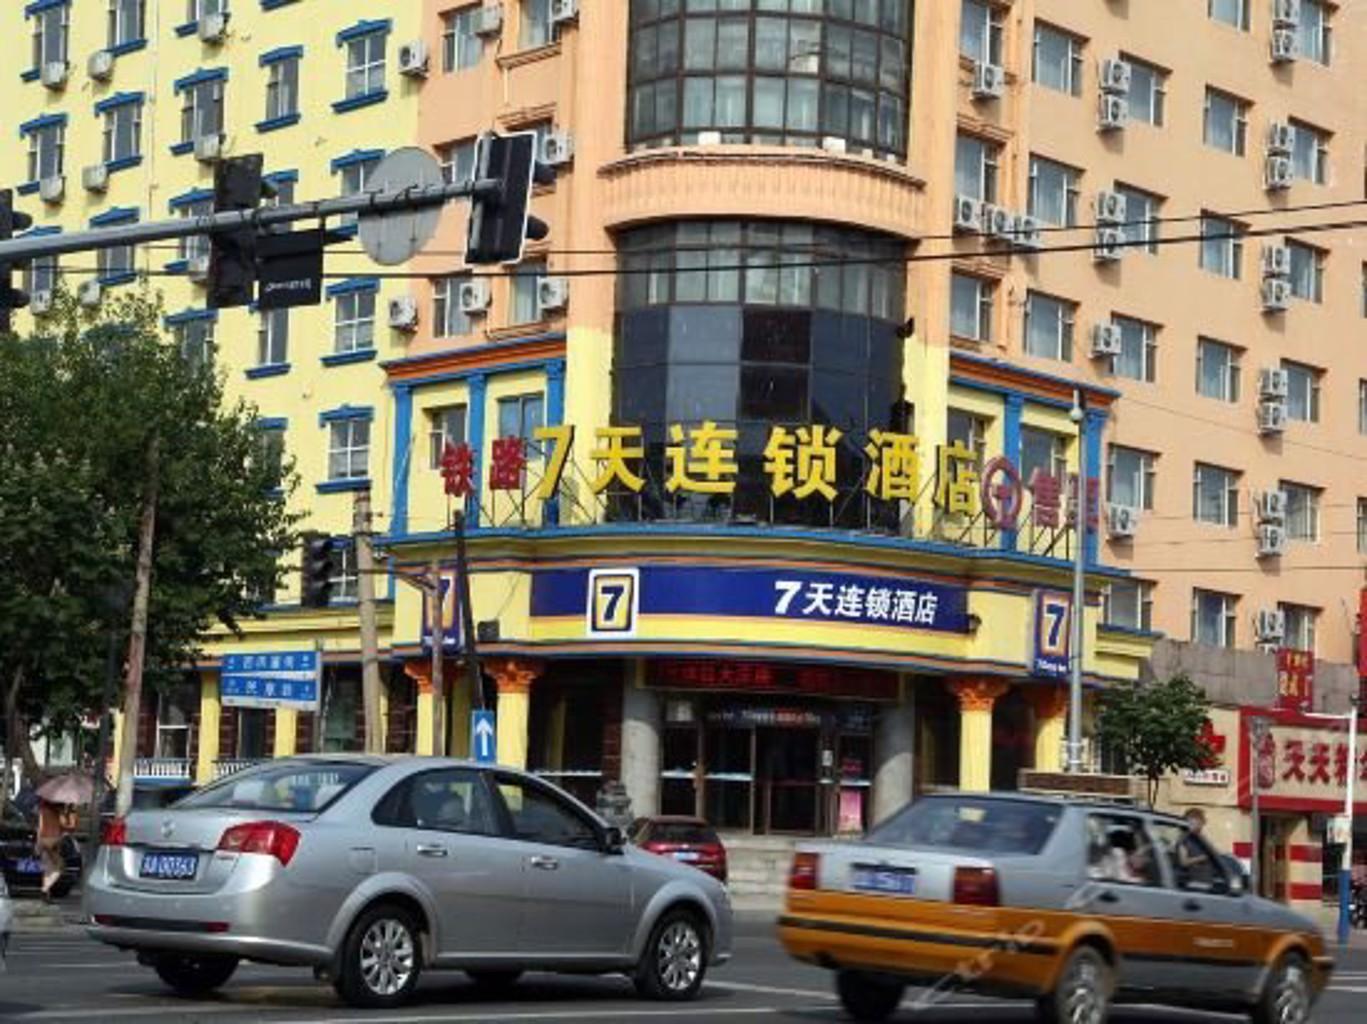 7 Days Inn Renmin Square Minkang Road